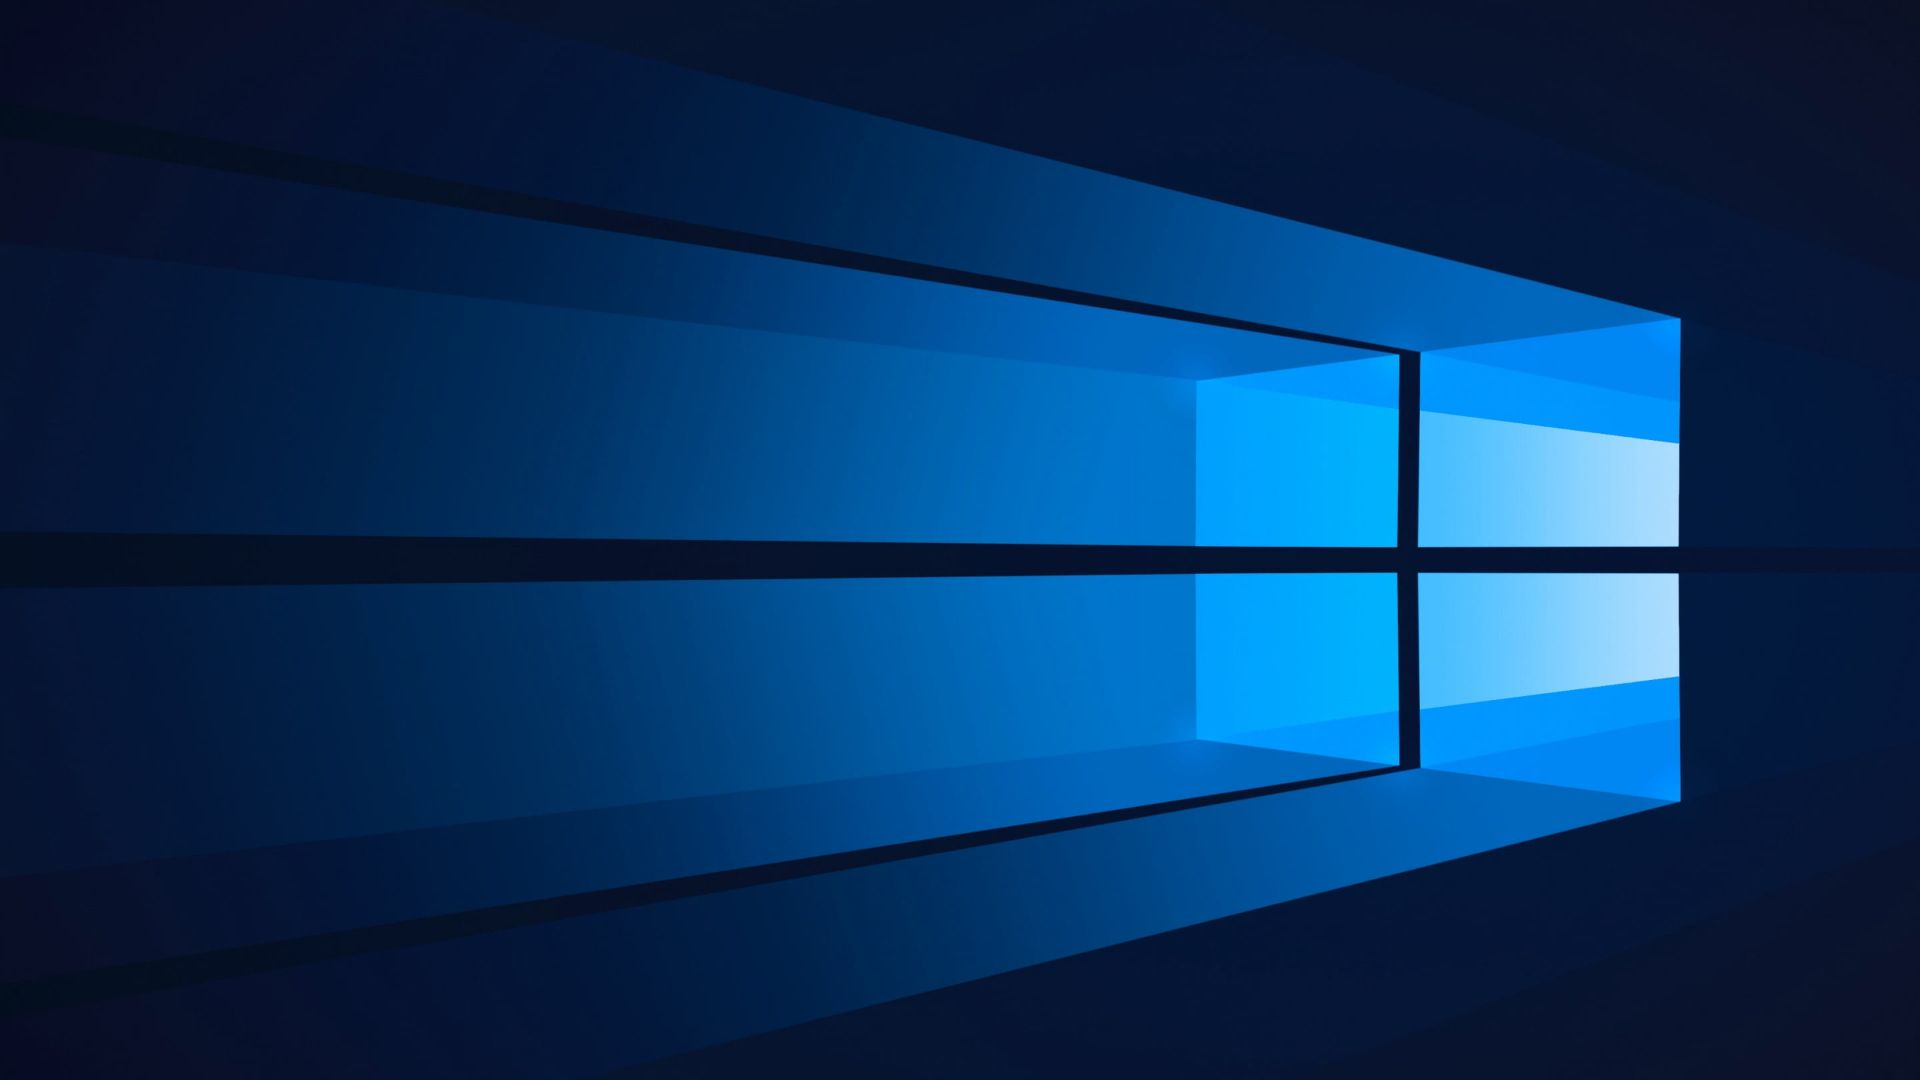 Windows 10 Windows 10 Windows Wallpaper Modern Windows